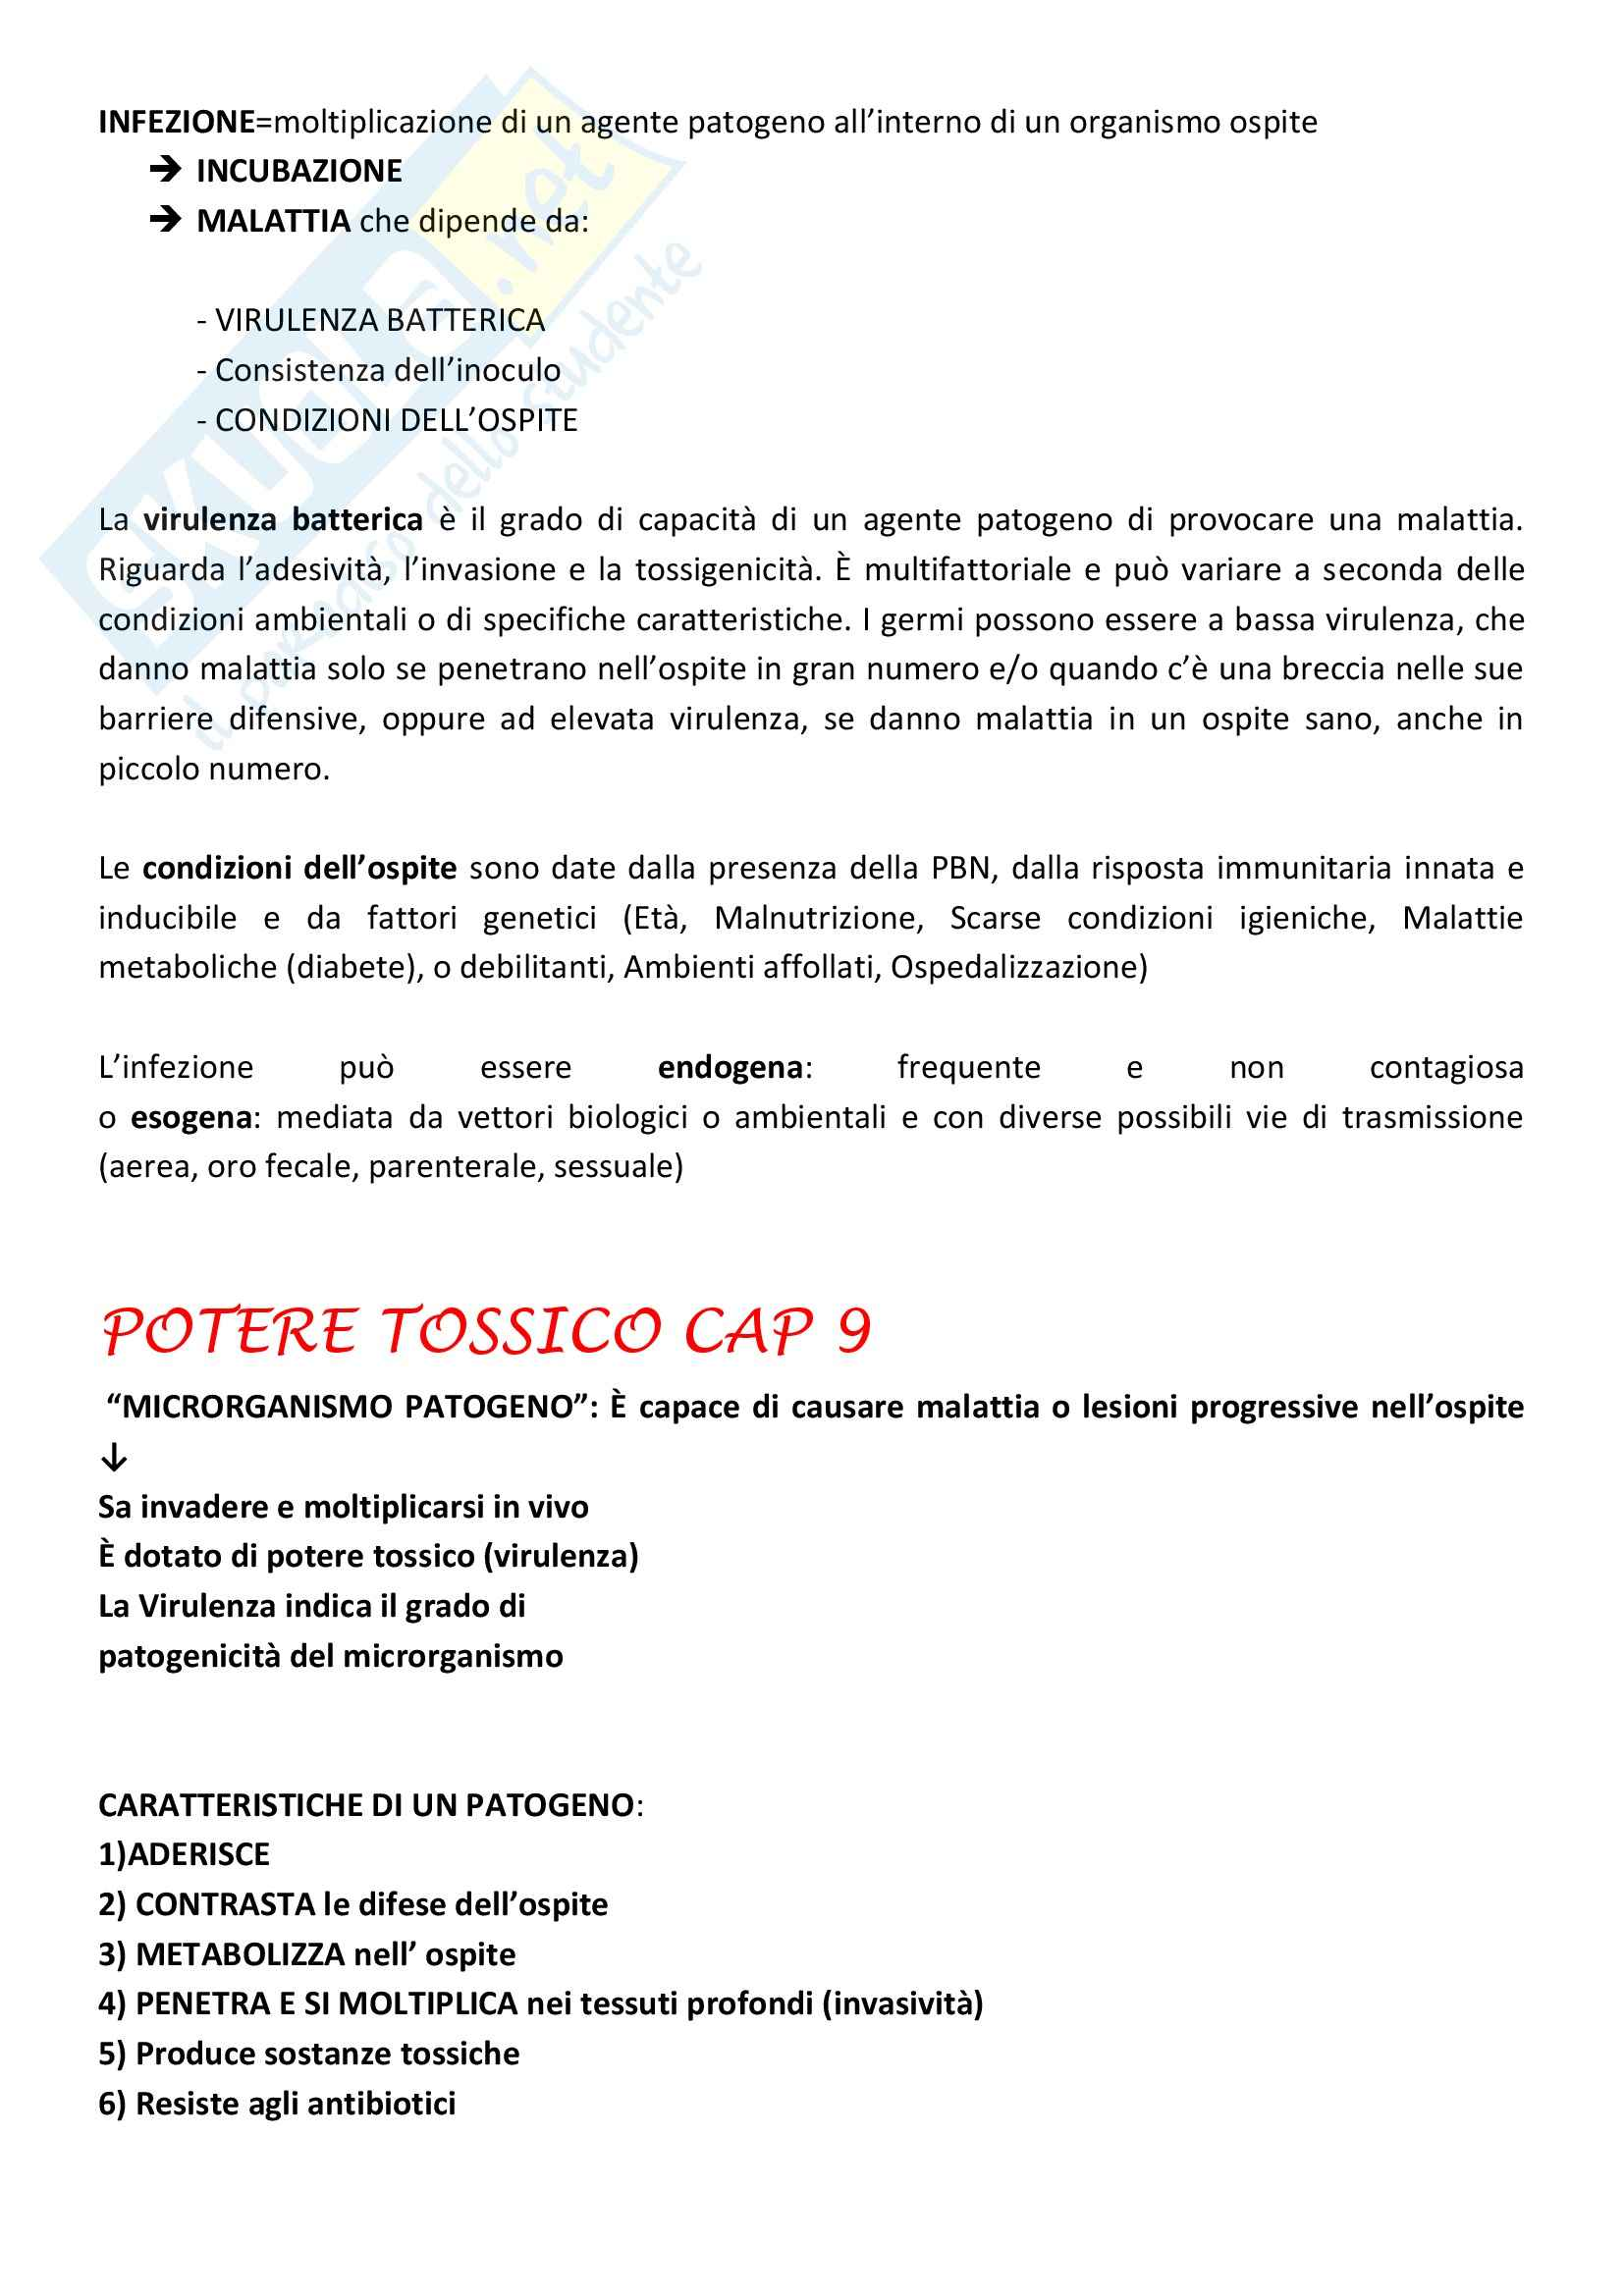 Microbiologia - Appunti Pag. 21